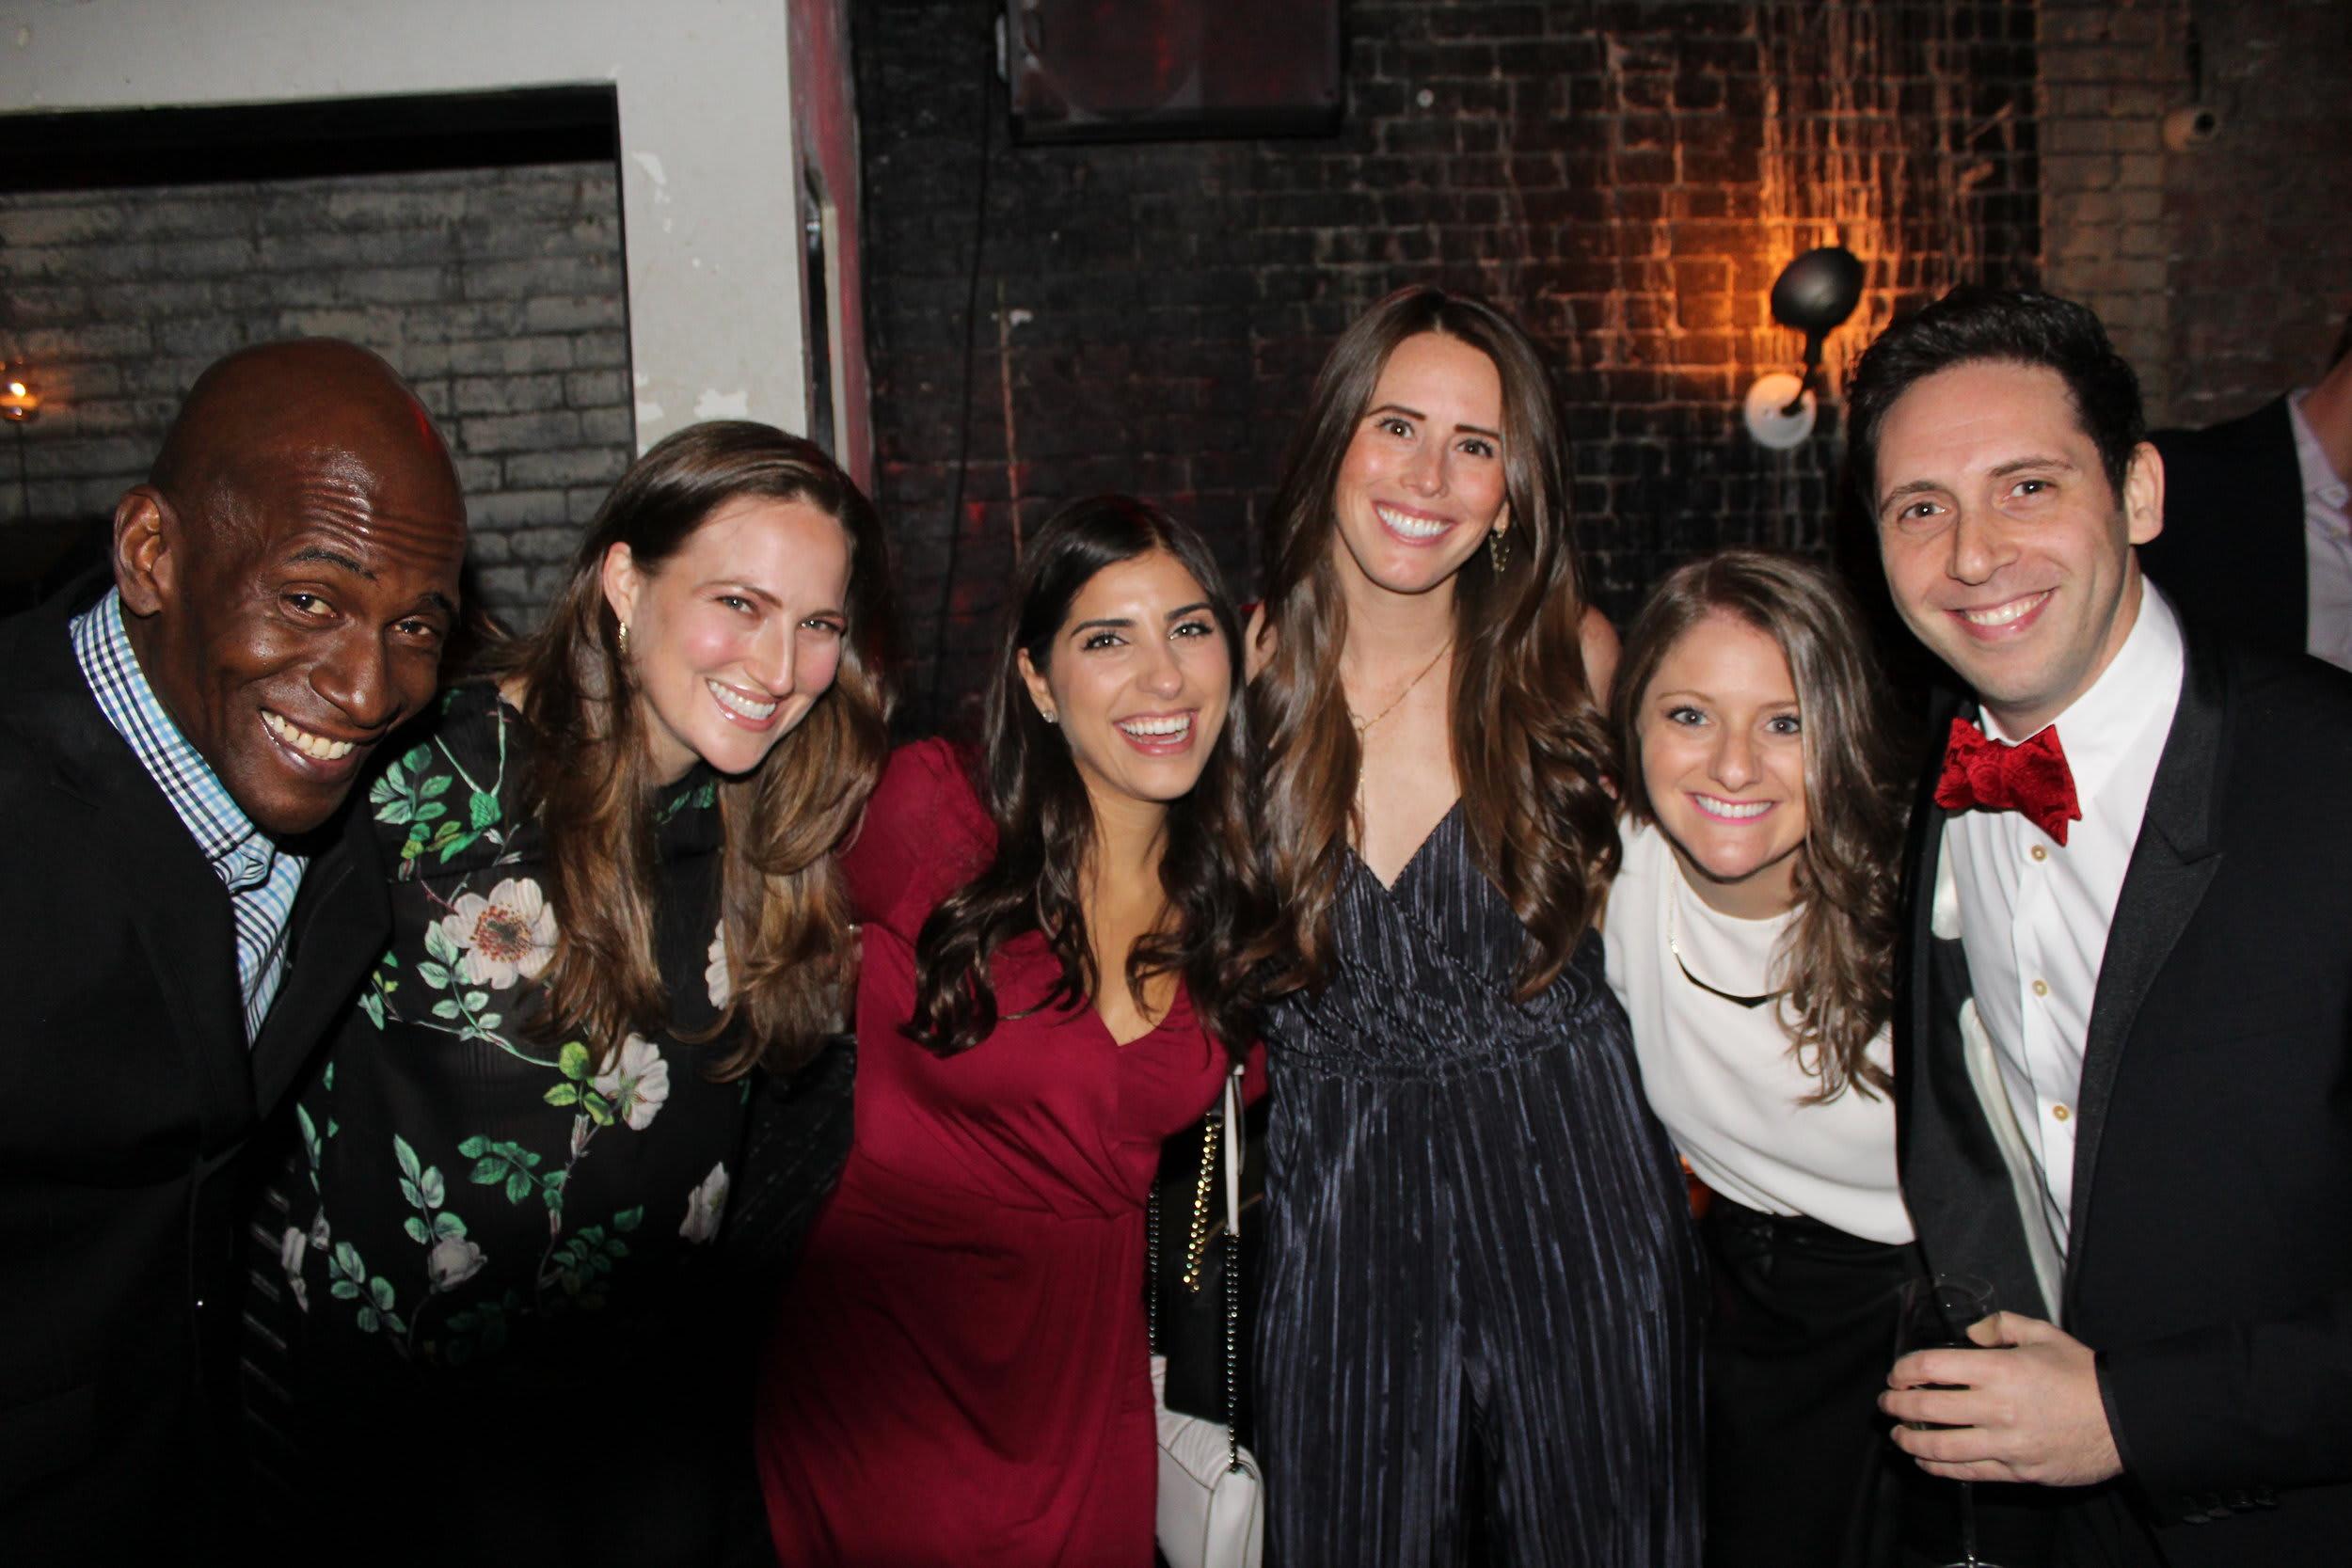 Meet Updater: Jenna Weinerman, VP, Marketing